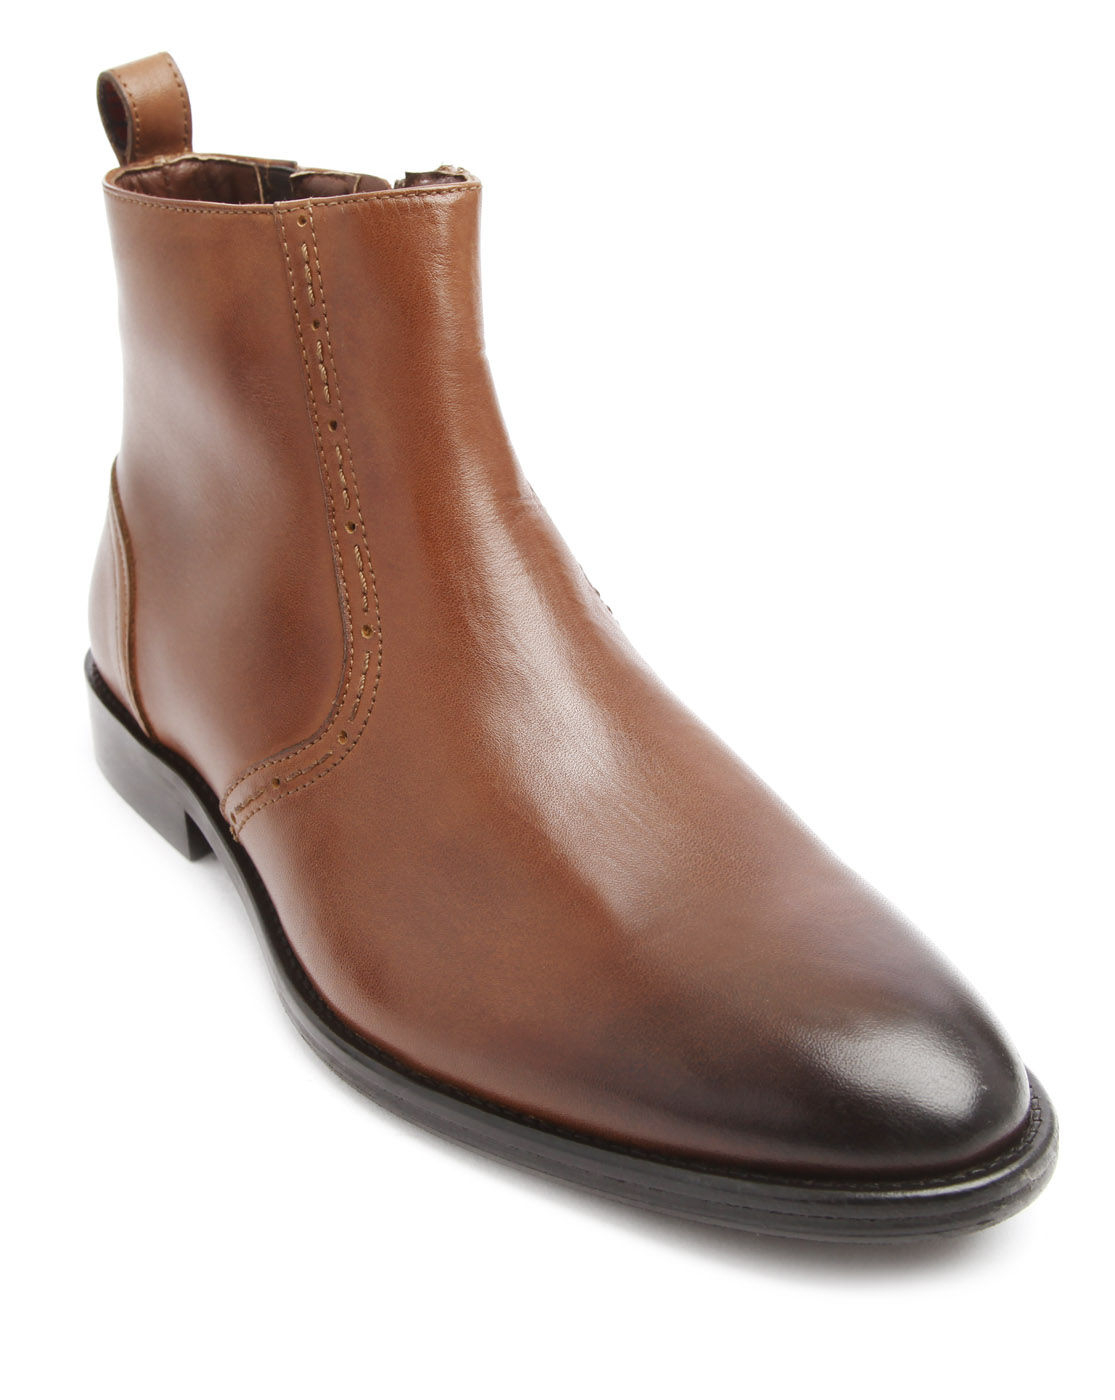 tommy hilfiger dalton cognac 4a boots in brown for men lyst. Black Bedroom Furniture Sets. Home Design Ideas